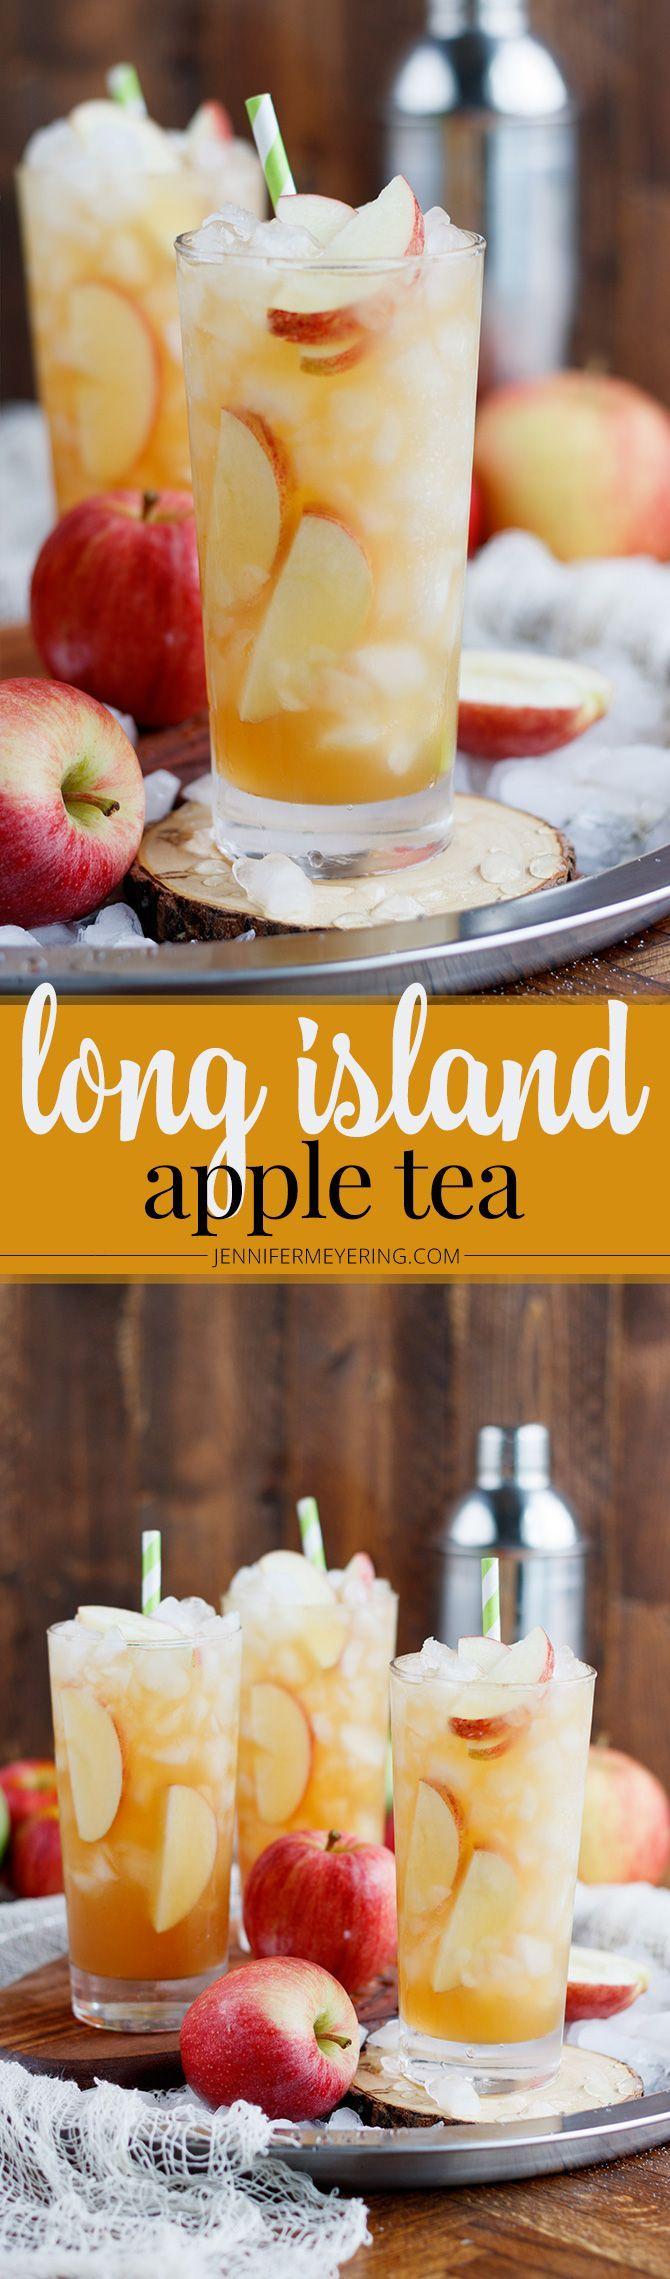 Long Island Apple Iced Tea - JenniferMeyering.com